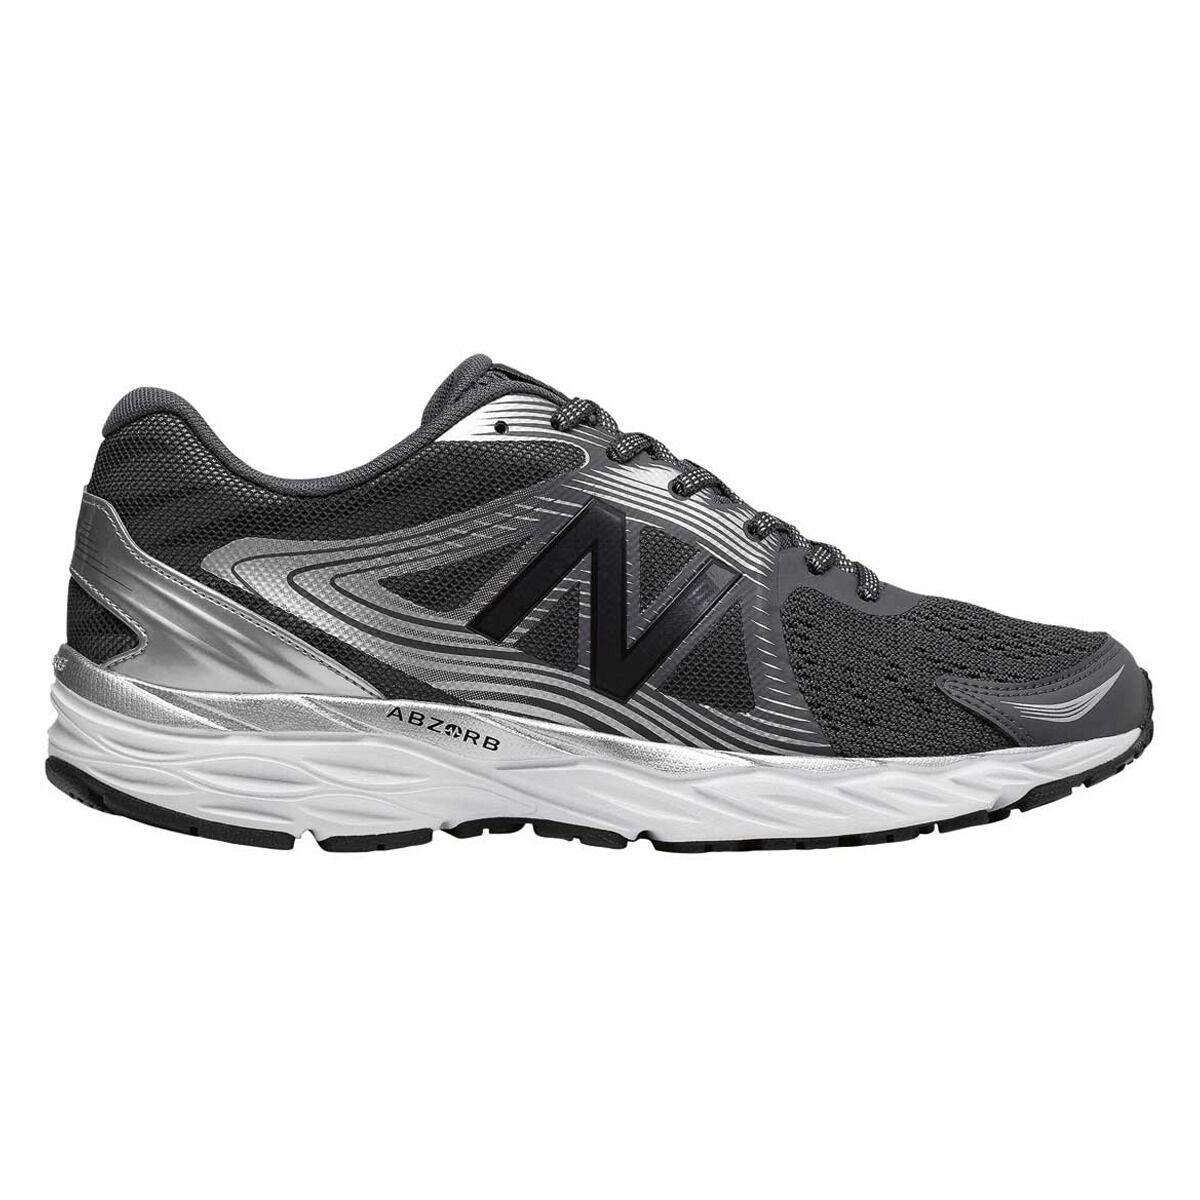 4b02dff4d38 ... coupon code for new balance 680 v4 mens running shoes dark grey us 8  dark grey